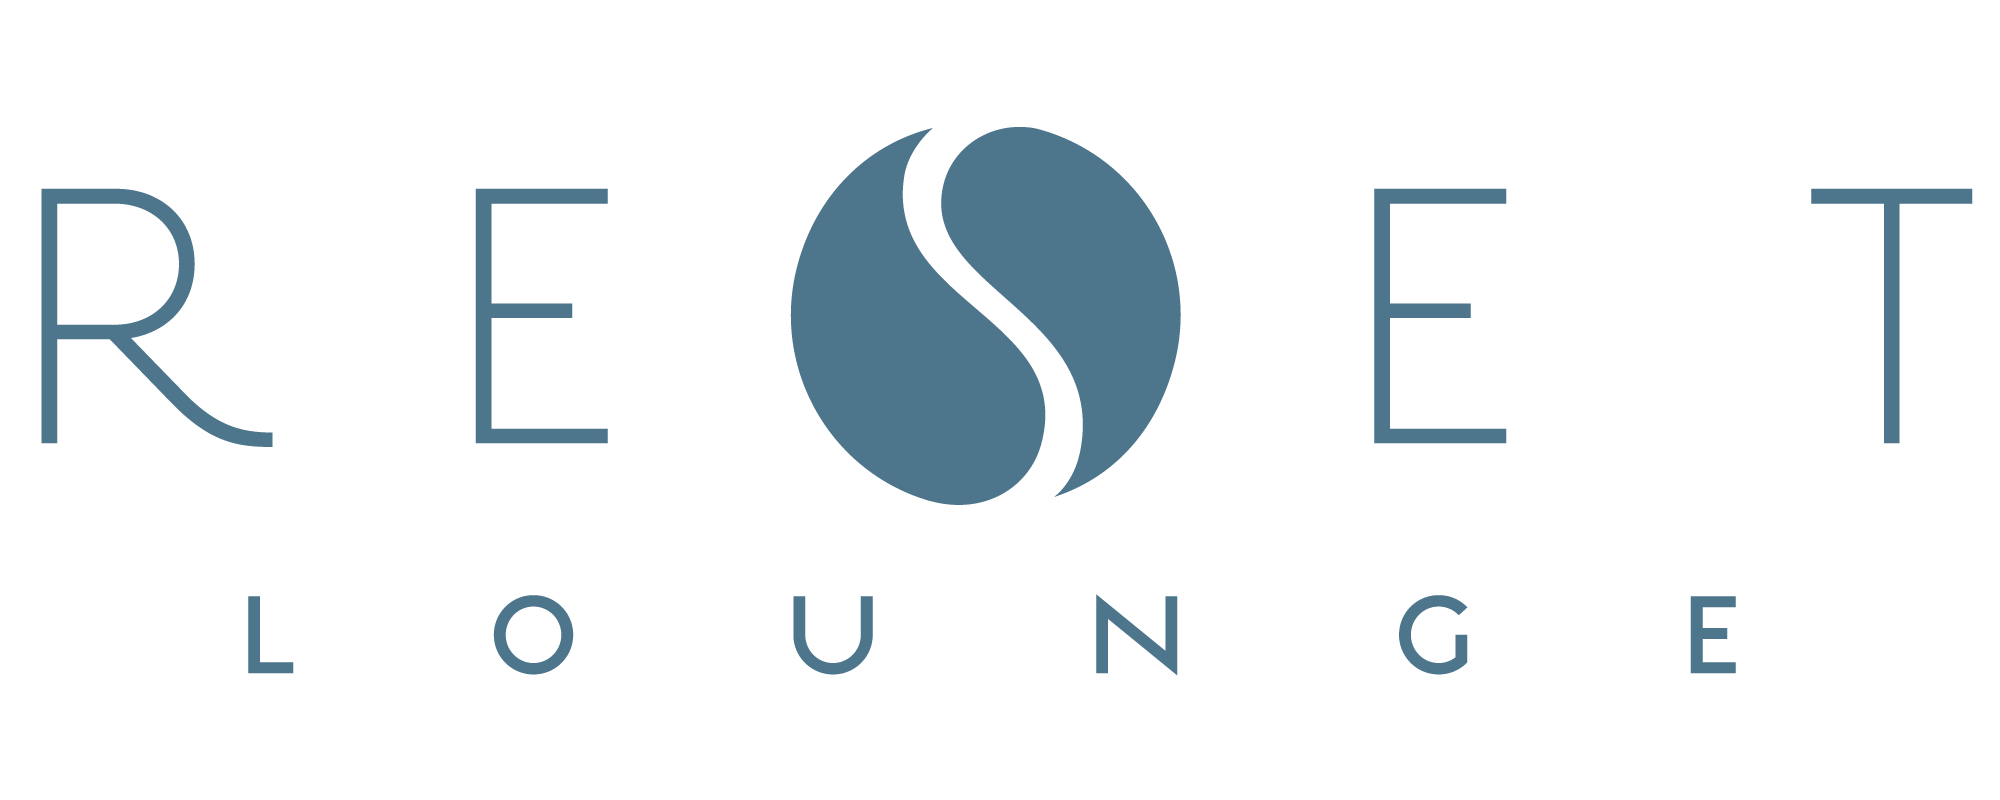 Reset-Logo_5405C